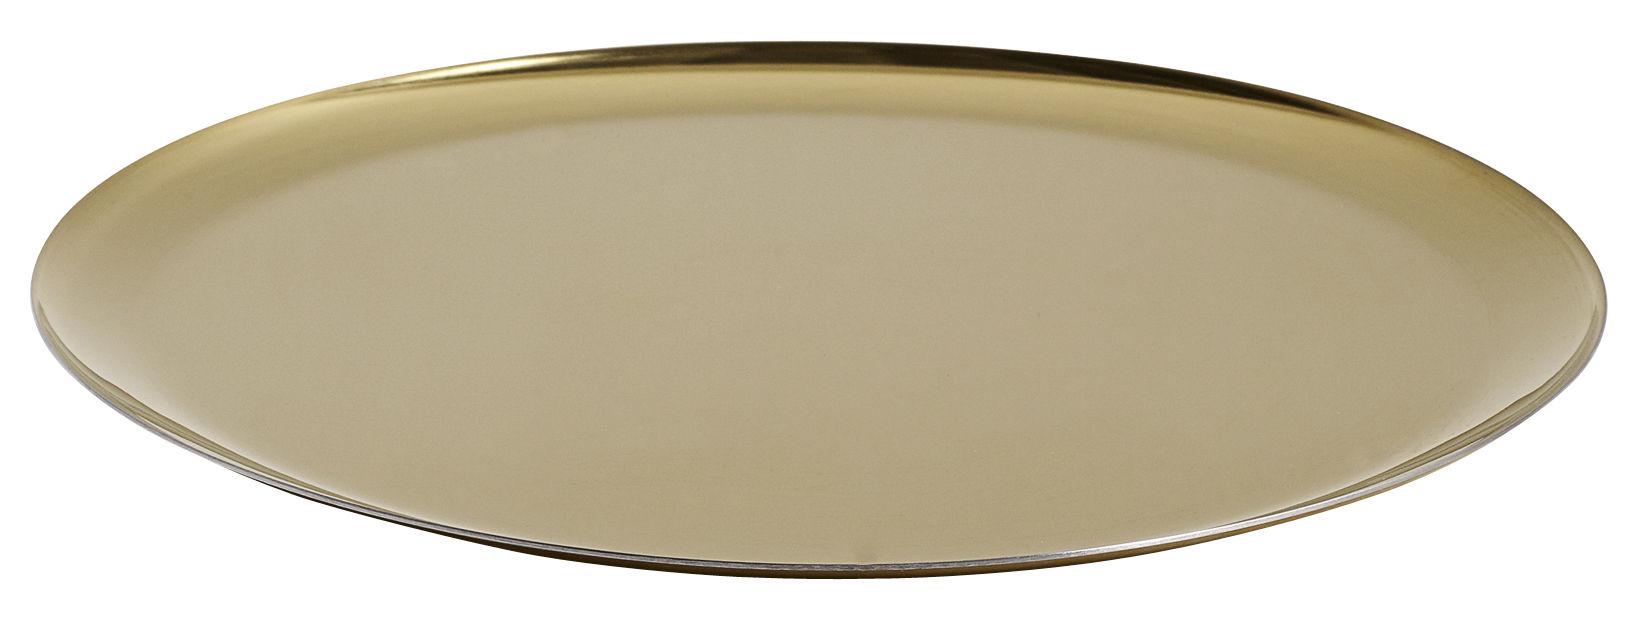 Arts de la table - Plateaux - Plateau / Ø 28 cm - Acciaio - Hay - Or - Acier inoxydable